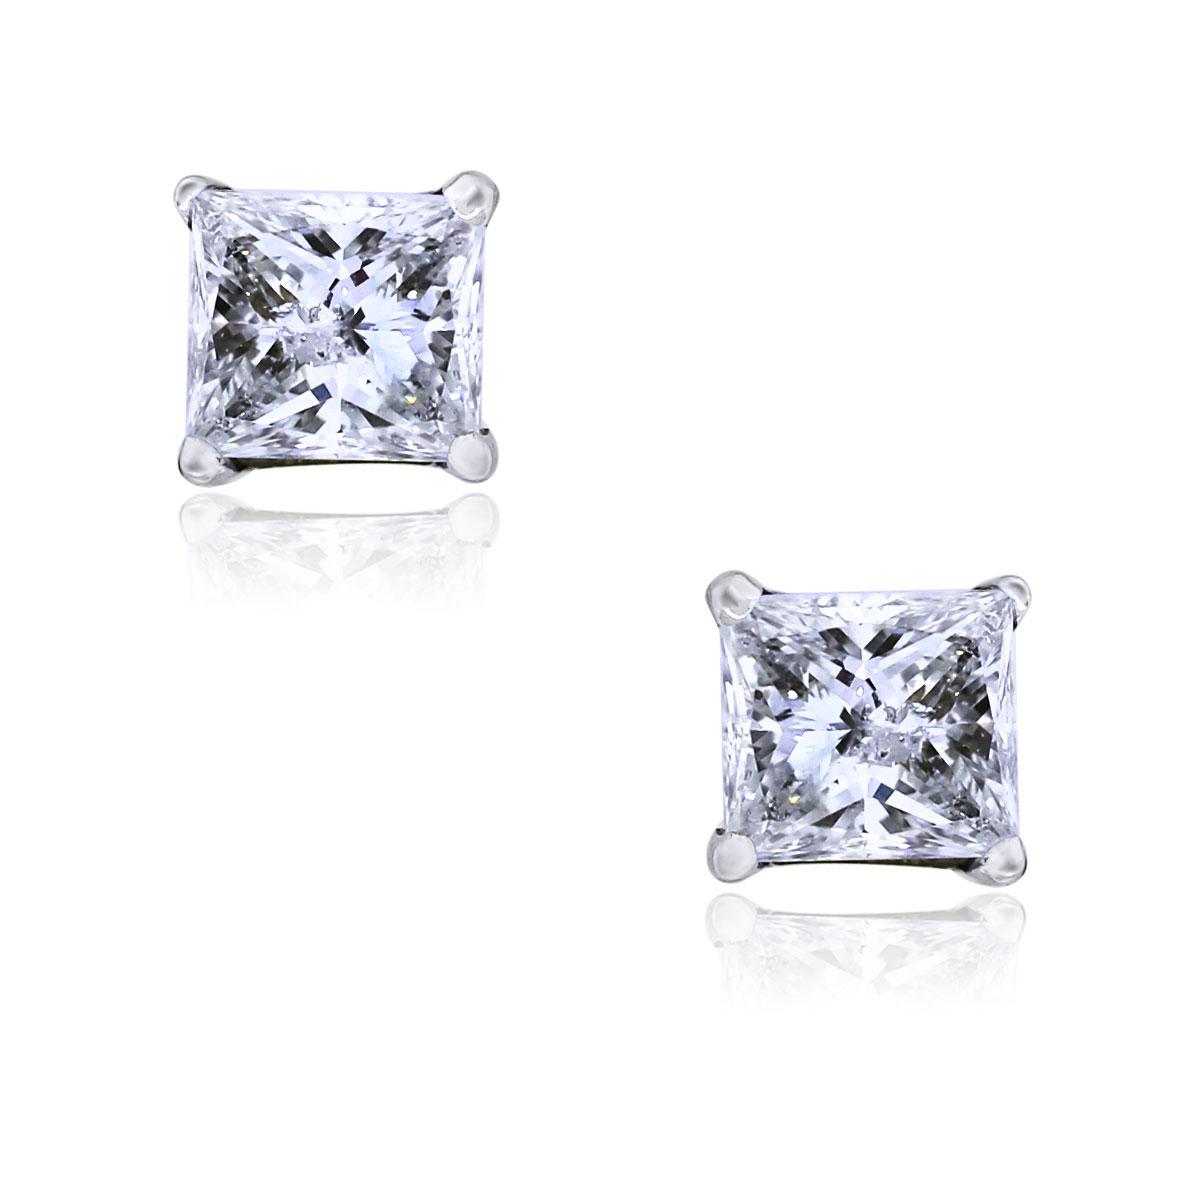 14k White Gold Princess Cut Diamond Stud Earrings Boca Raton